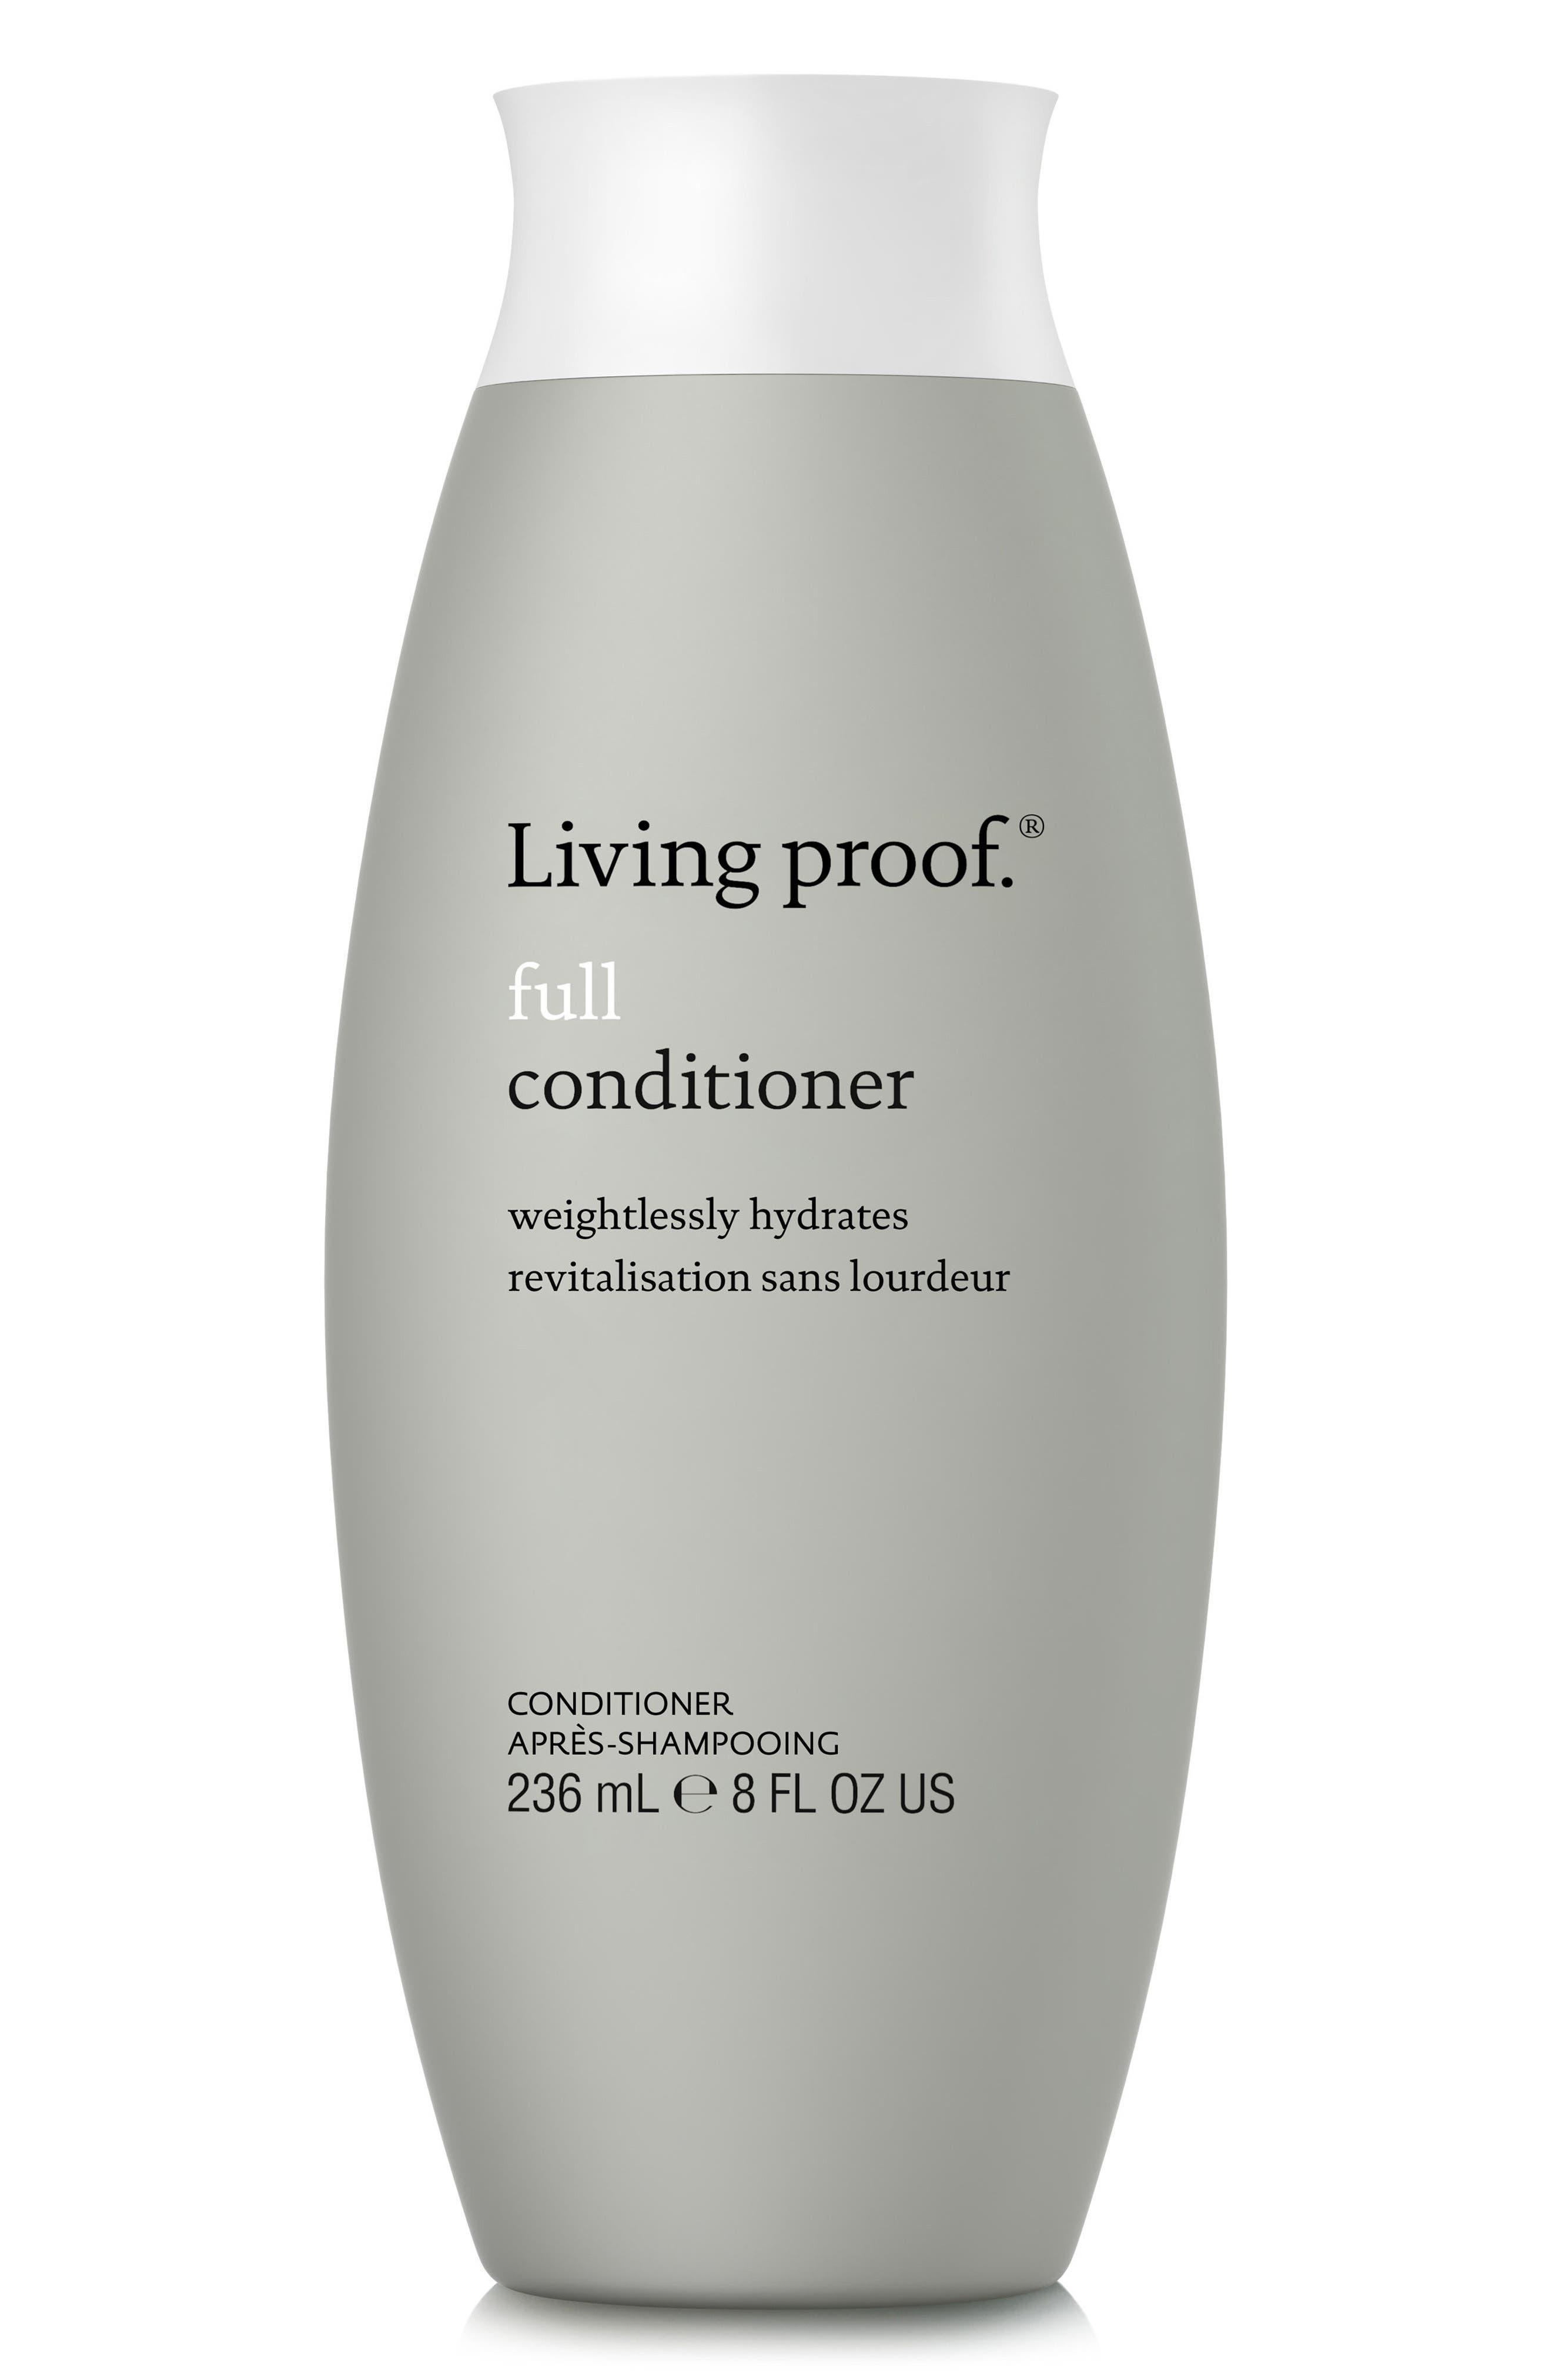 Living proof® Full Conditioner